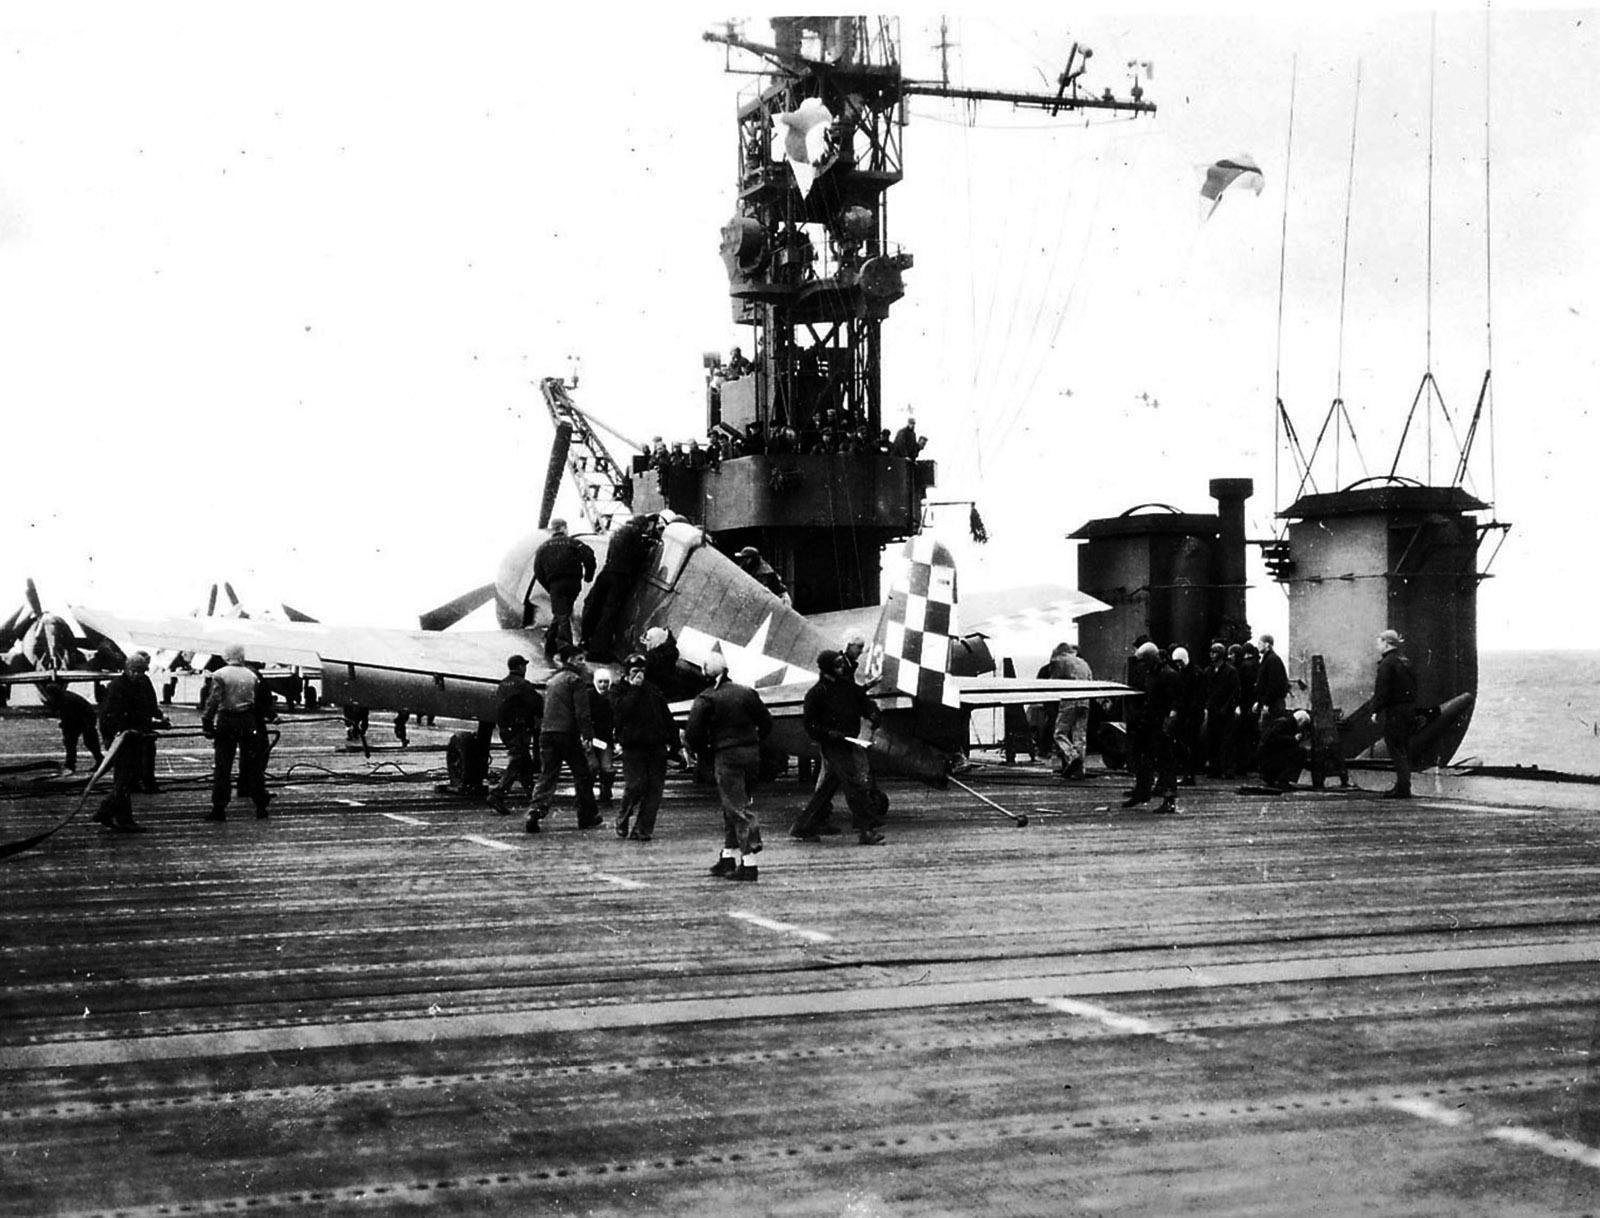 Grumman F6F 5 Hellcat VF 46 White 13 landing mishap CVL 22 USS Independence 01